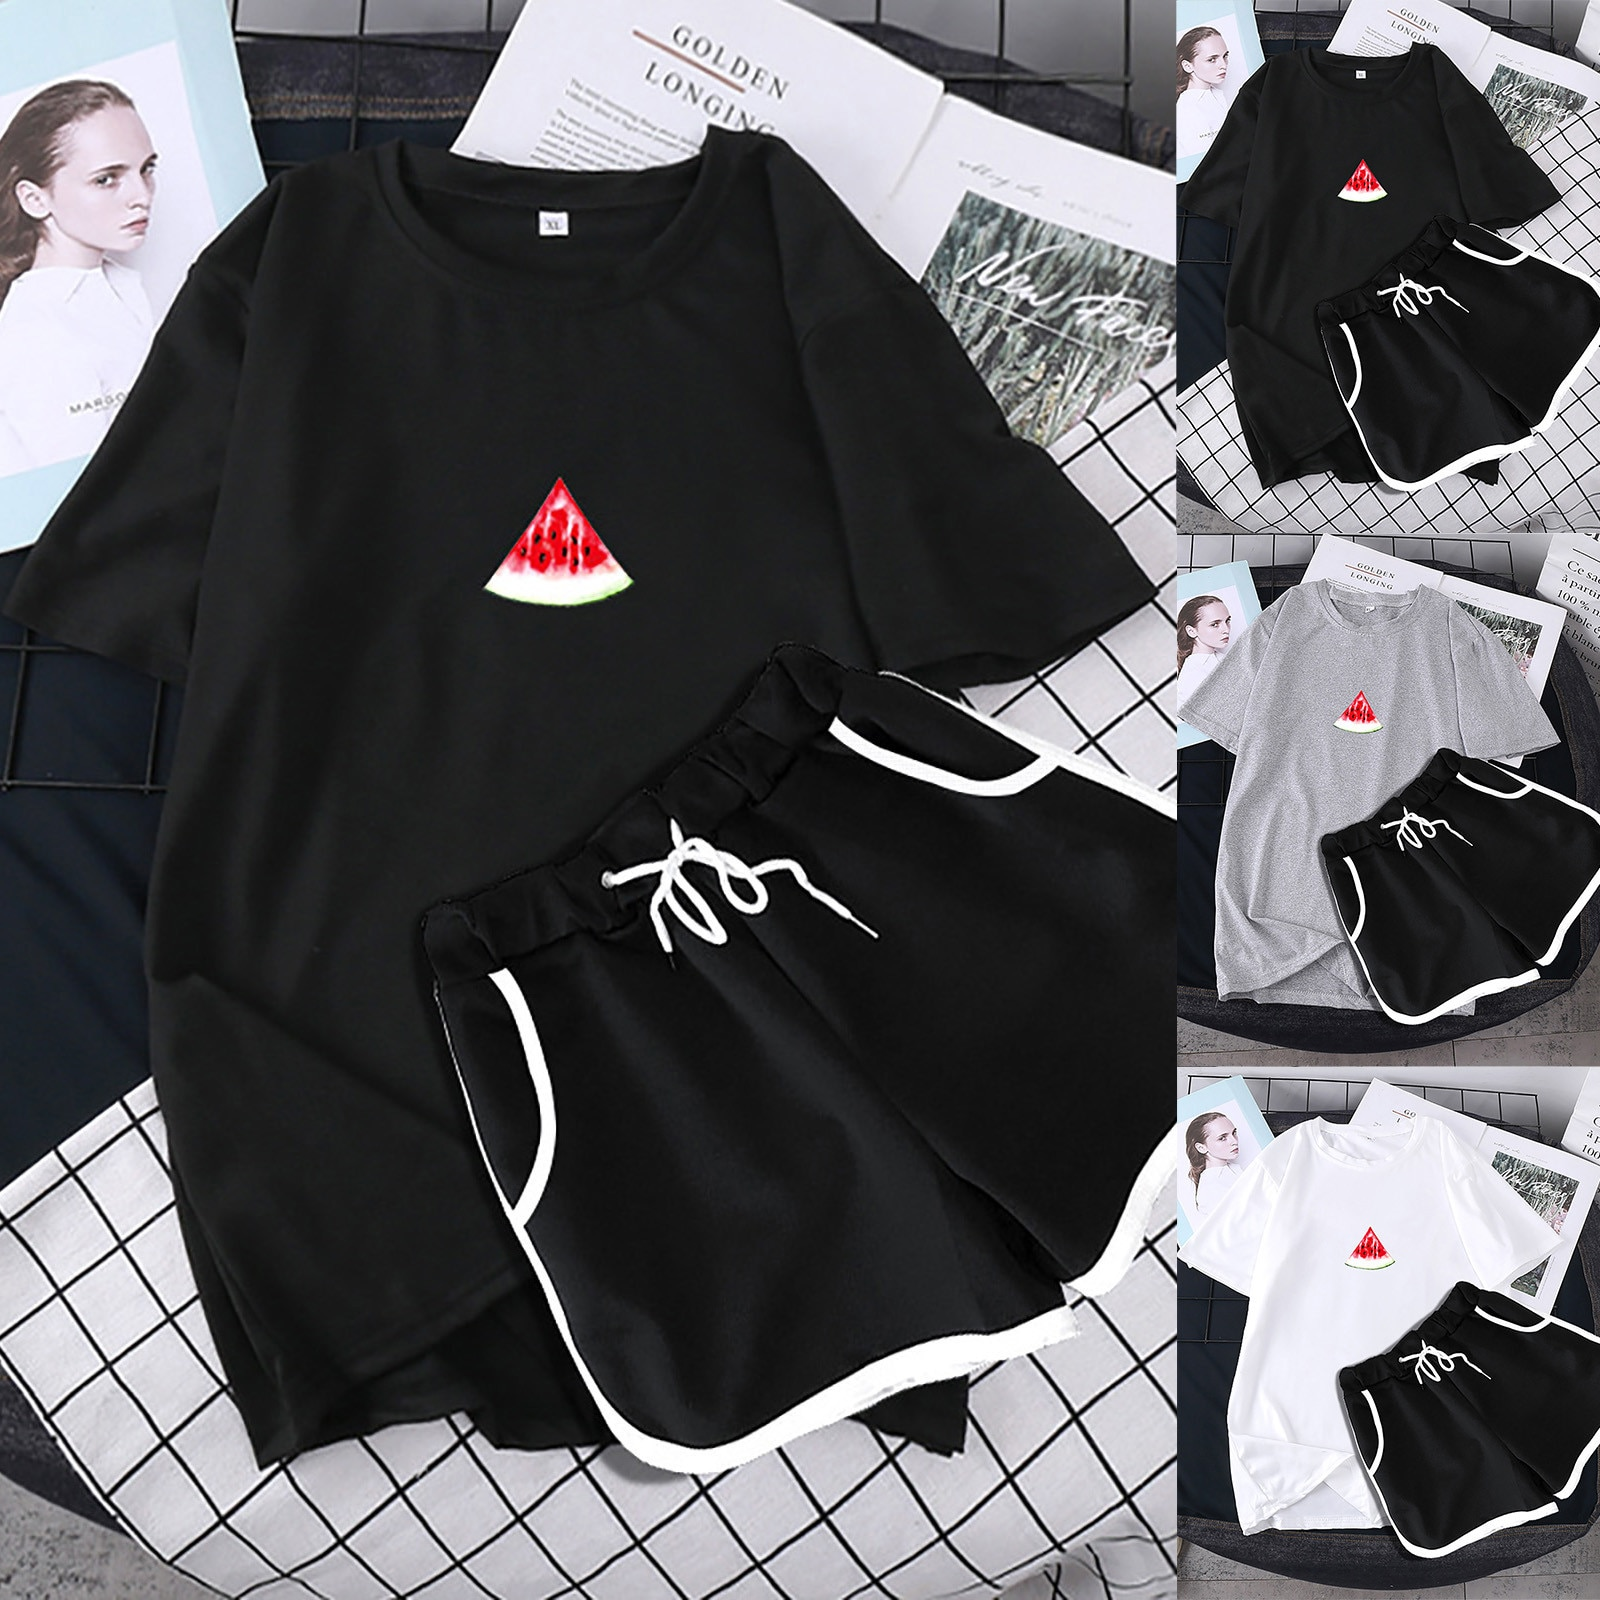 ISHOWTIENDA Women Two Piece Drop Sleeves Set Short Sleeve O-neck Paneled T Shirt Shorts Conjuntos De Mujer Outfits For Women